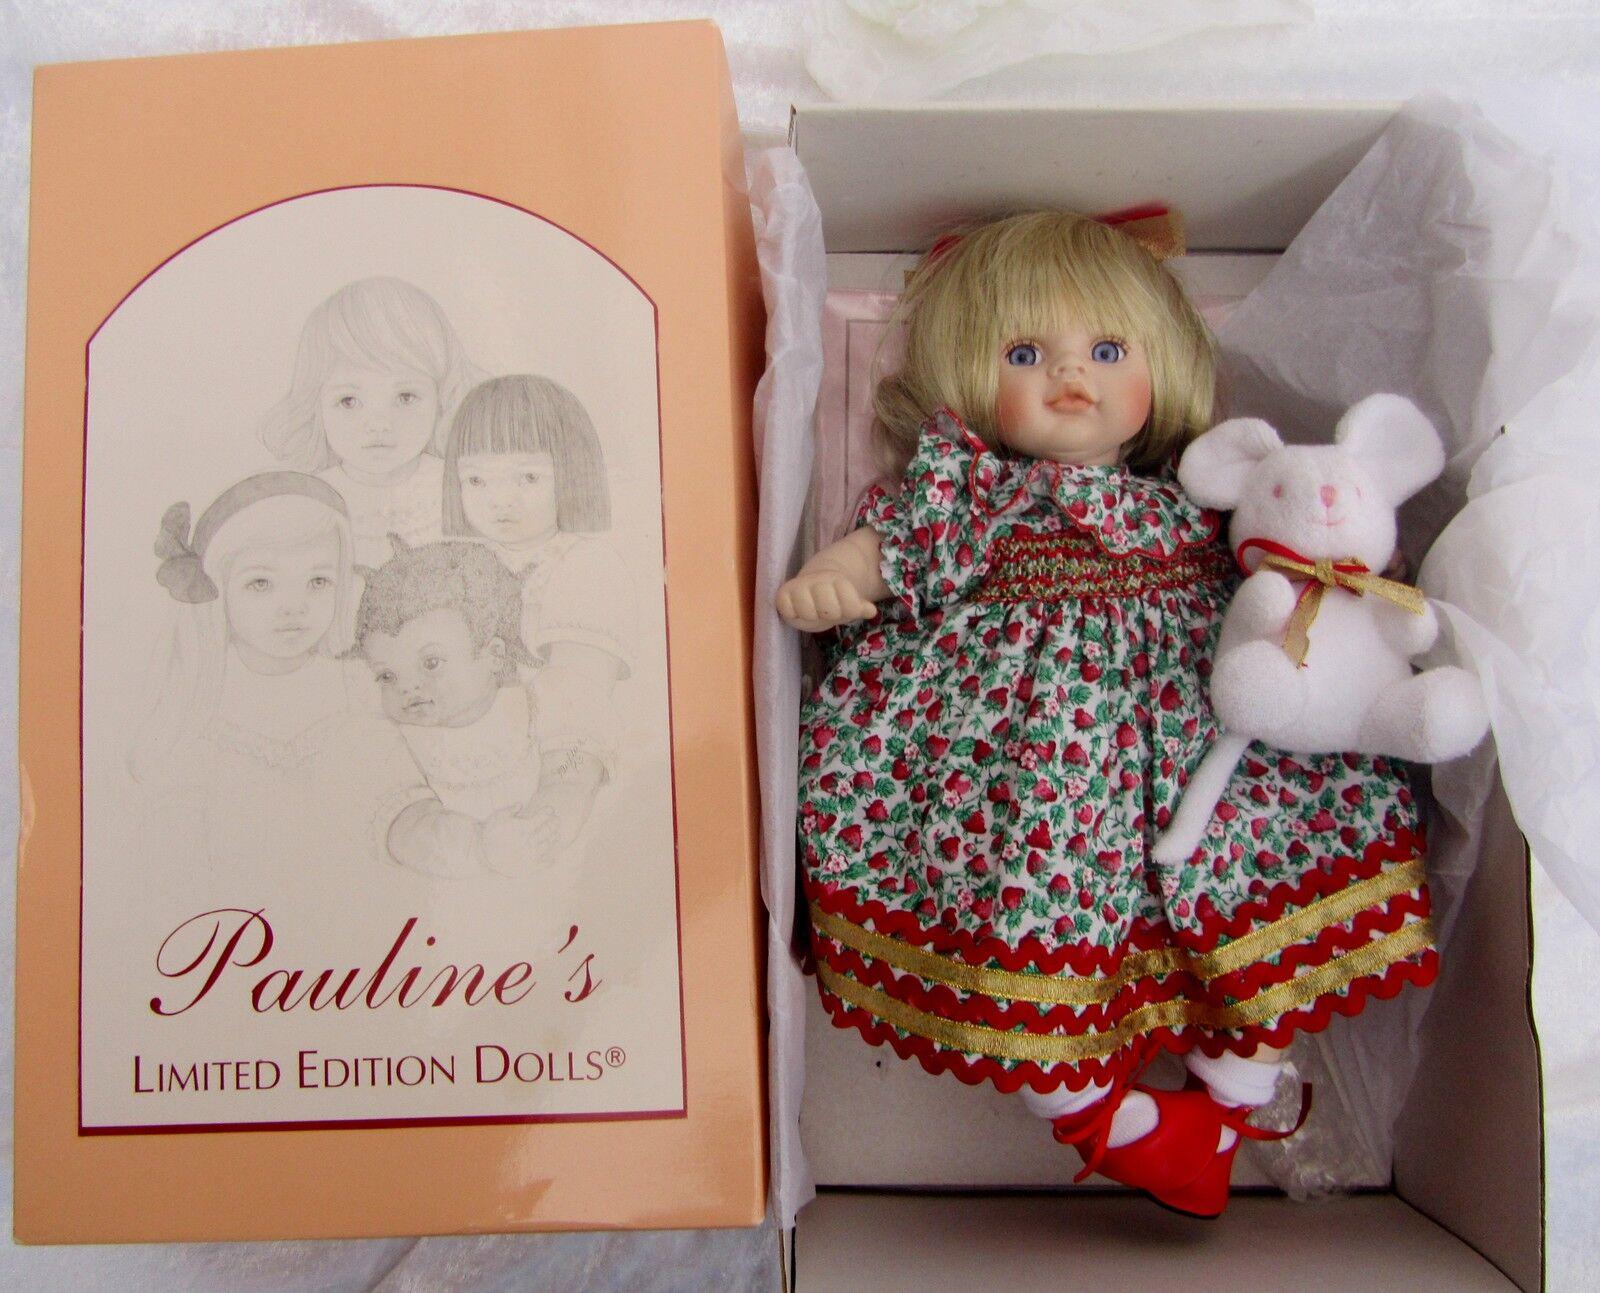 PAULINE     BJONNESS-JACOBSEN   CAROL LYN   LTD ED 280  C18123000000 -MOUSE